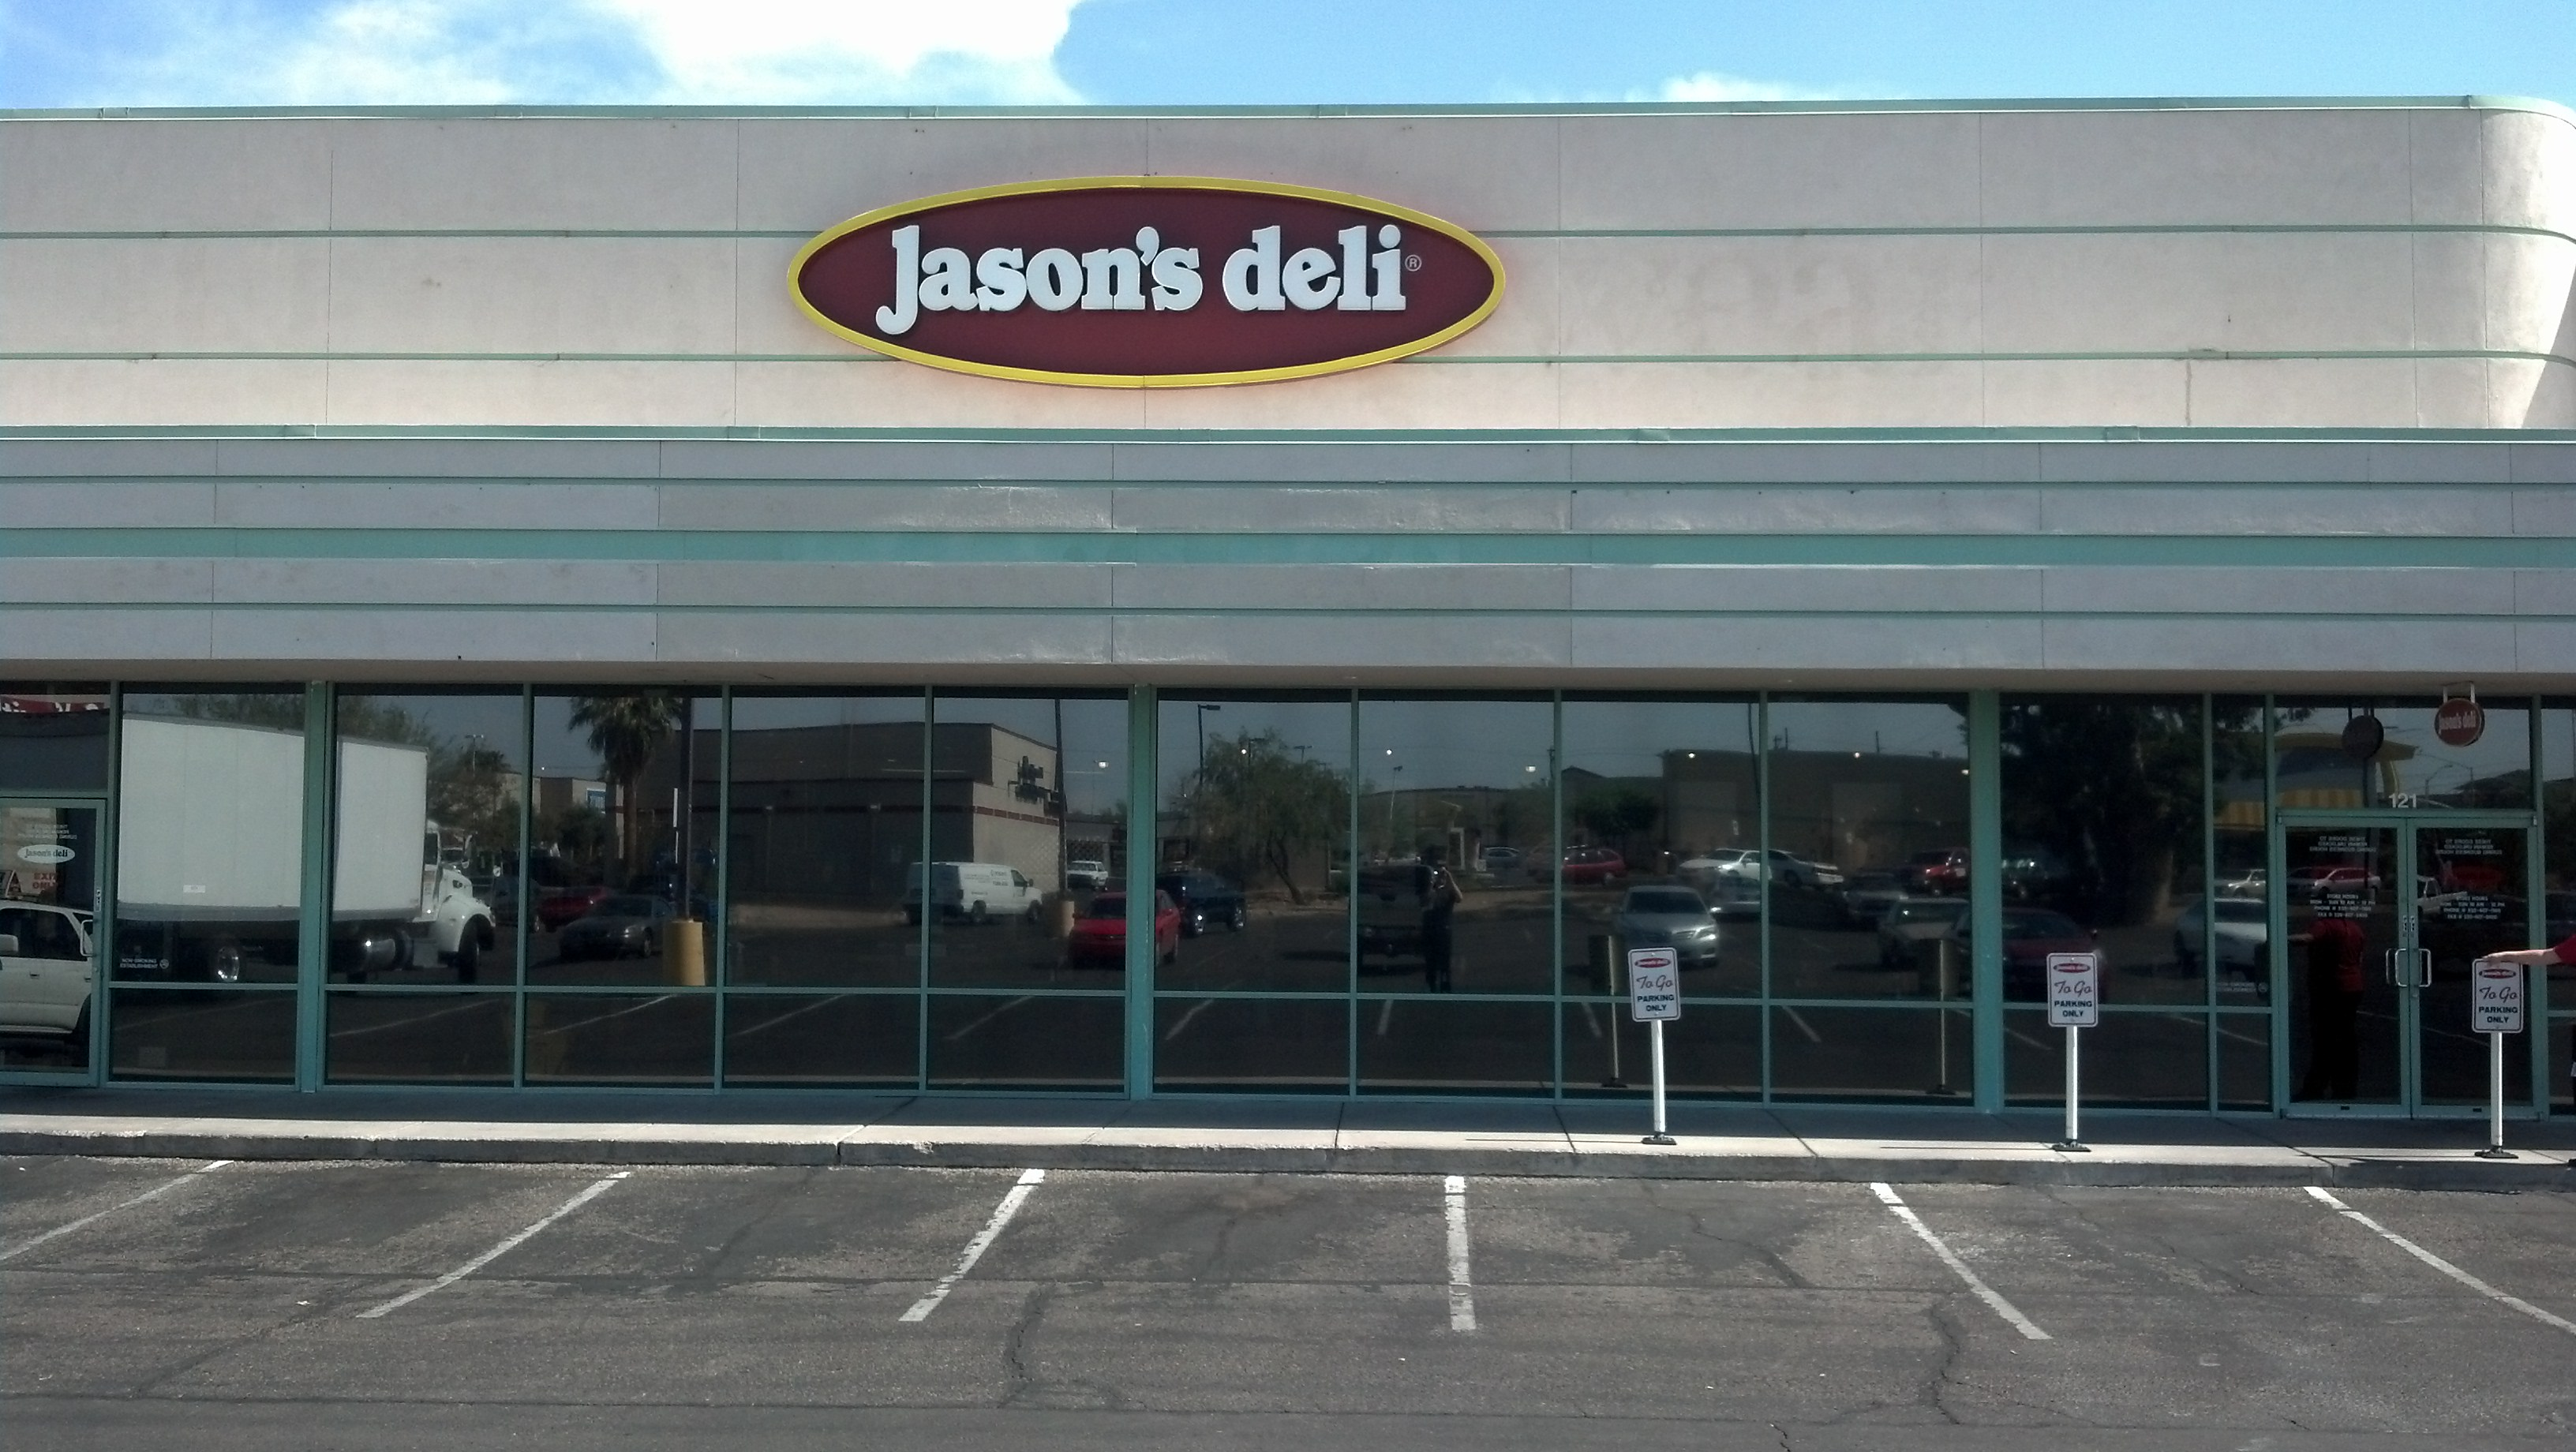 Jason's Deli in Tucson, AZ